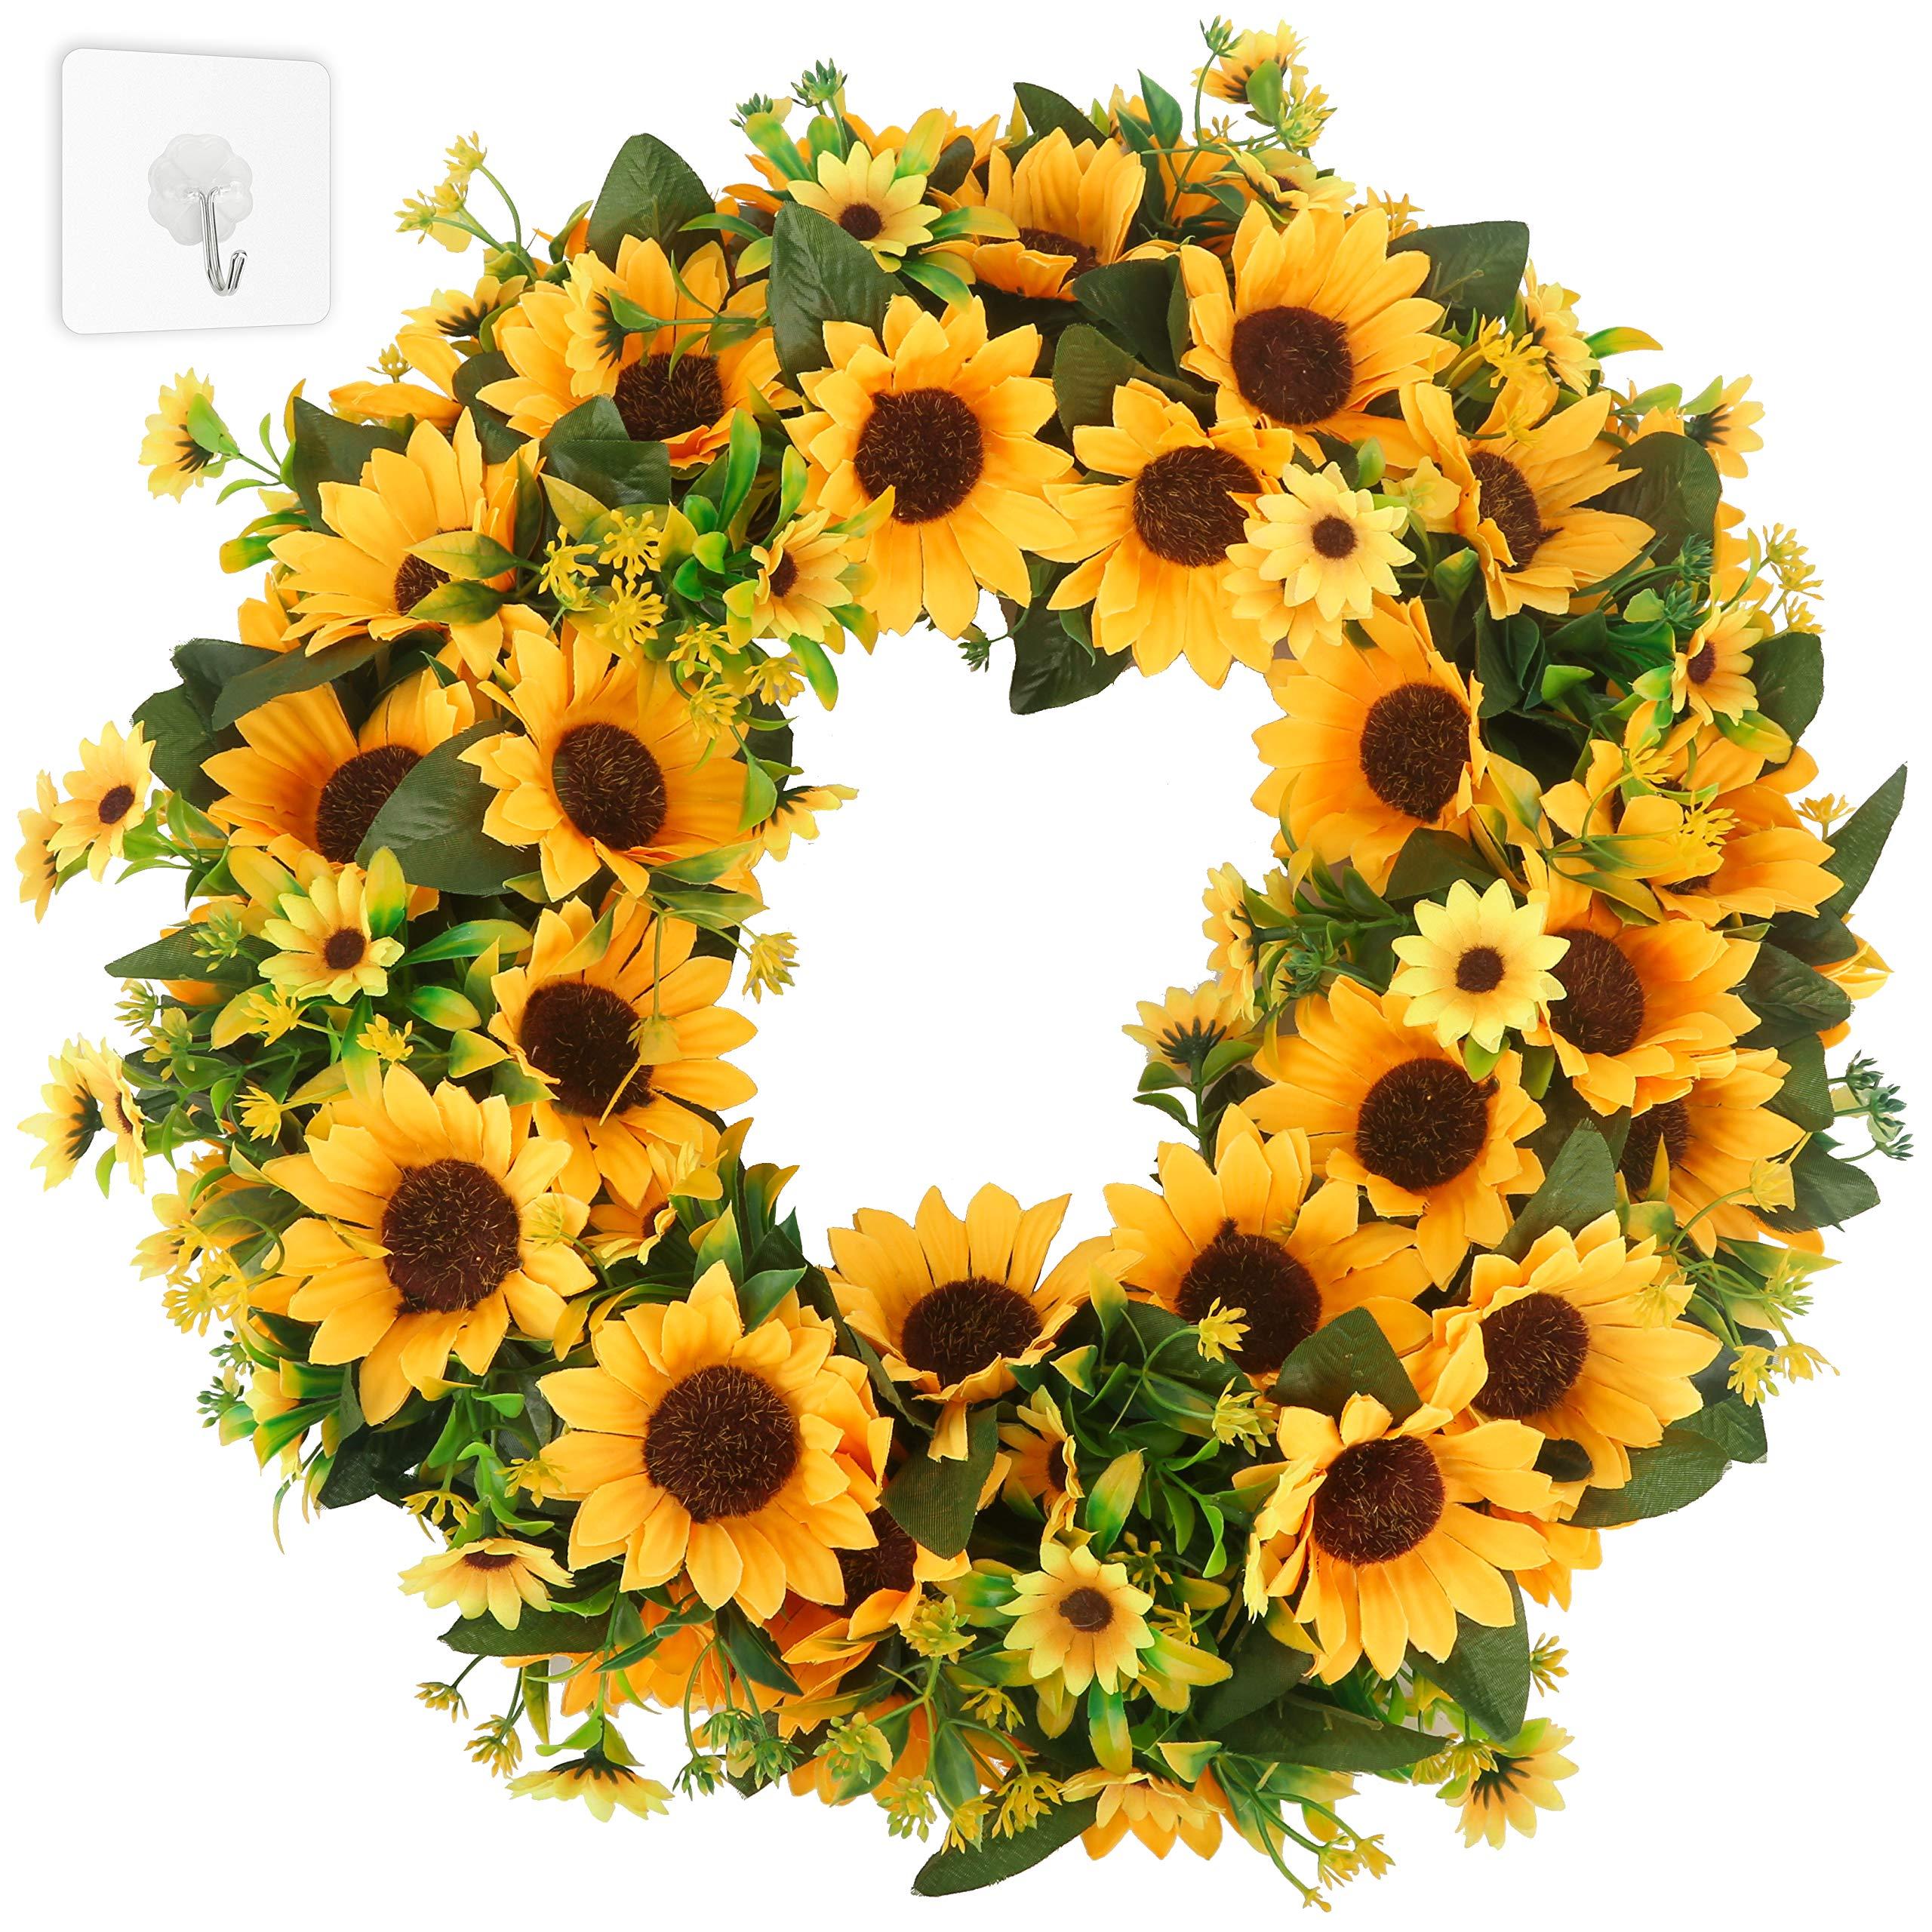 HANTAJANSS Artificial Sunflower Wreath, Large Sun Flower Greenery Garland for Door Decoration, Summer Home Decor 20 inches Yellow